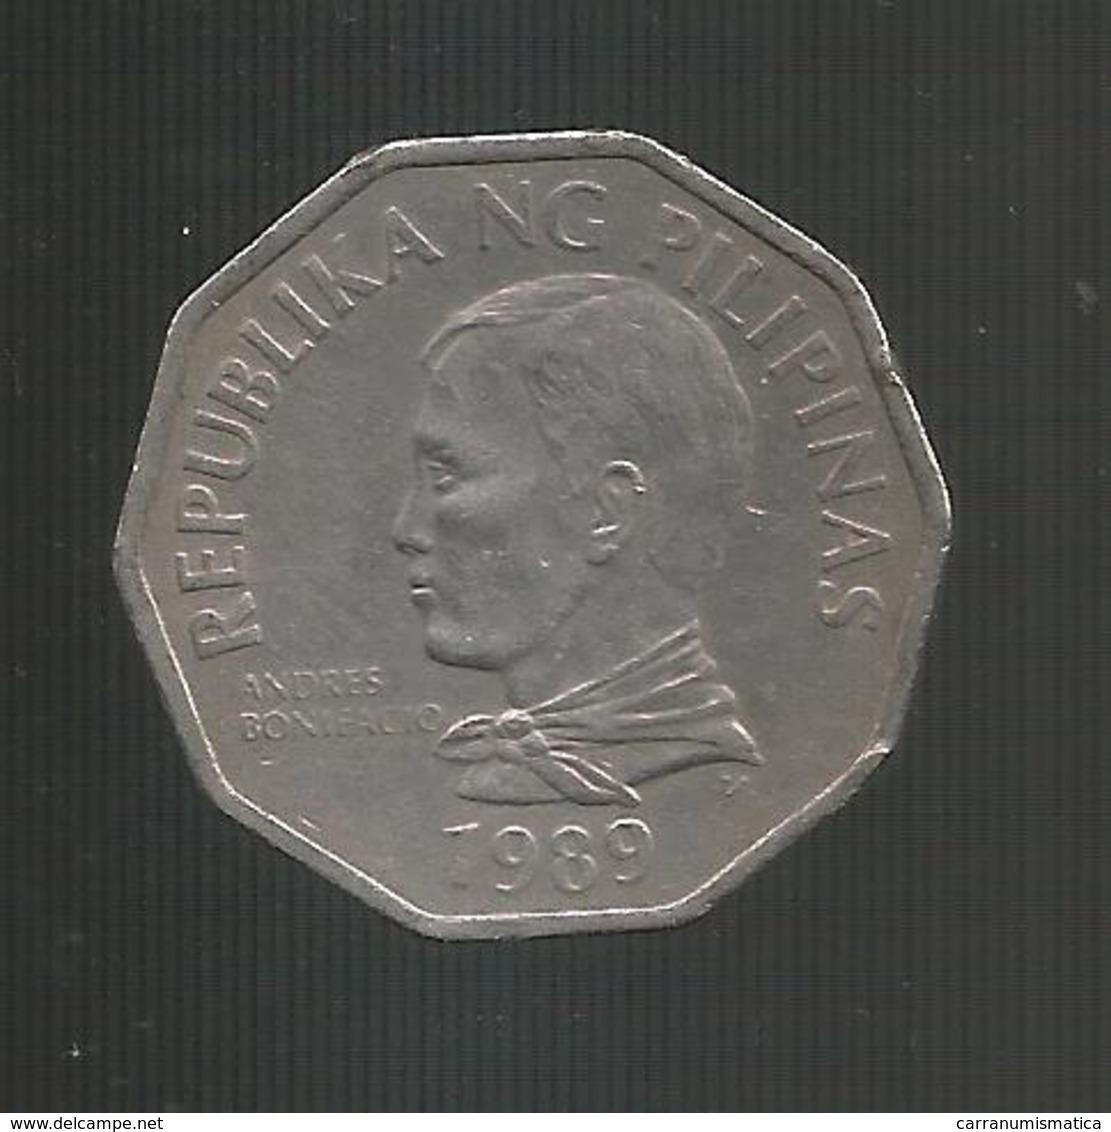 FILIPPINE / PILIPINAS - 2 PISO ( 1989 ) - Caraibi Orientali (Stati Dei)